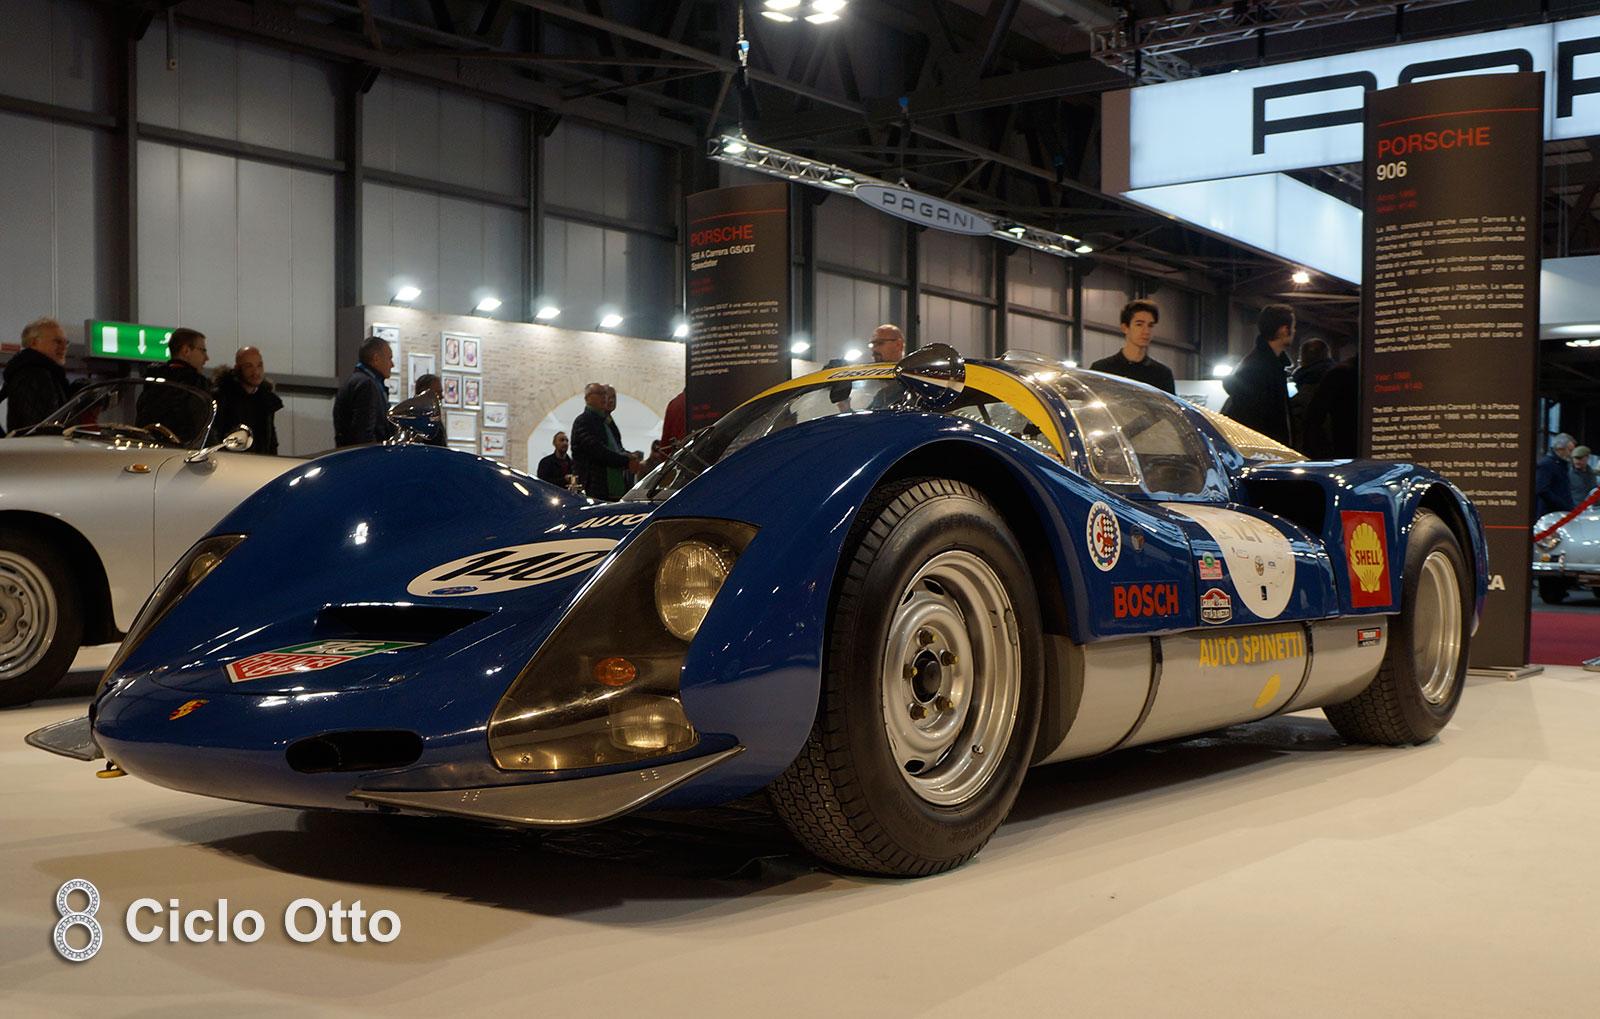 Porsche 906 - Stand di apertura Milano Autoclassica 2018